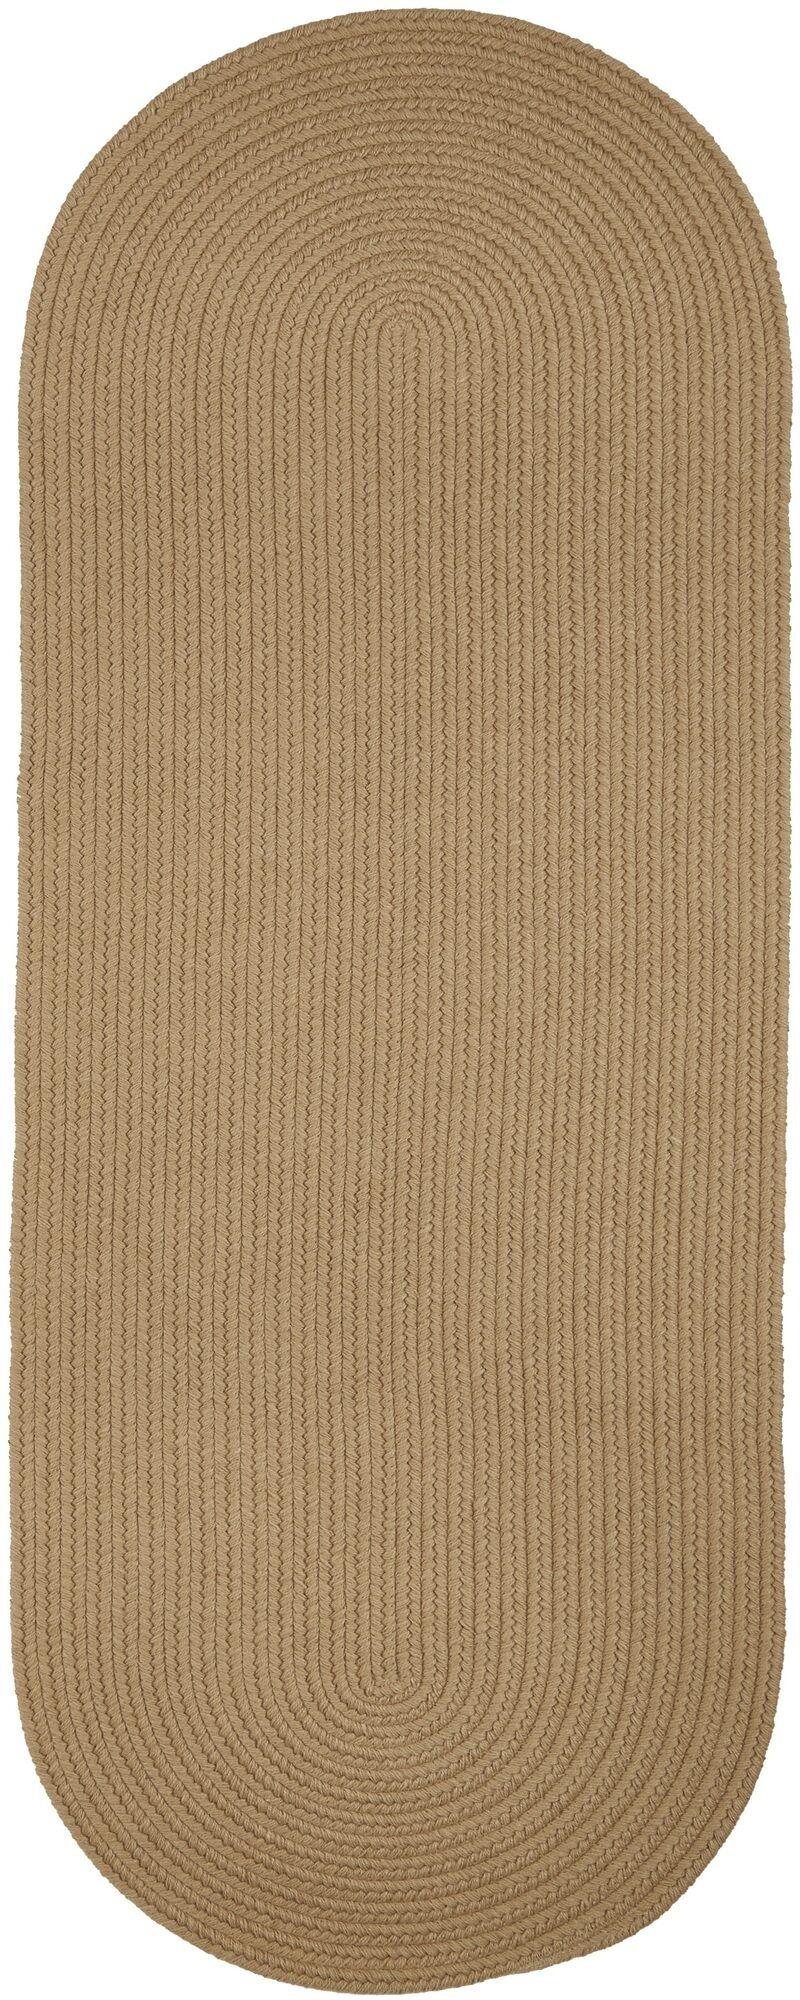 Handmade Taupe Area Rug Rug Size: Runner 2' x 6'